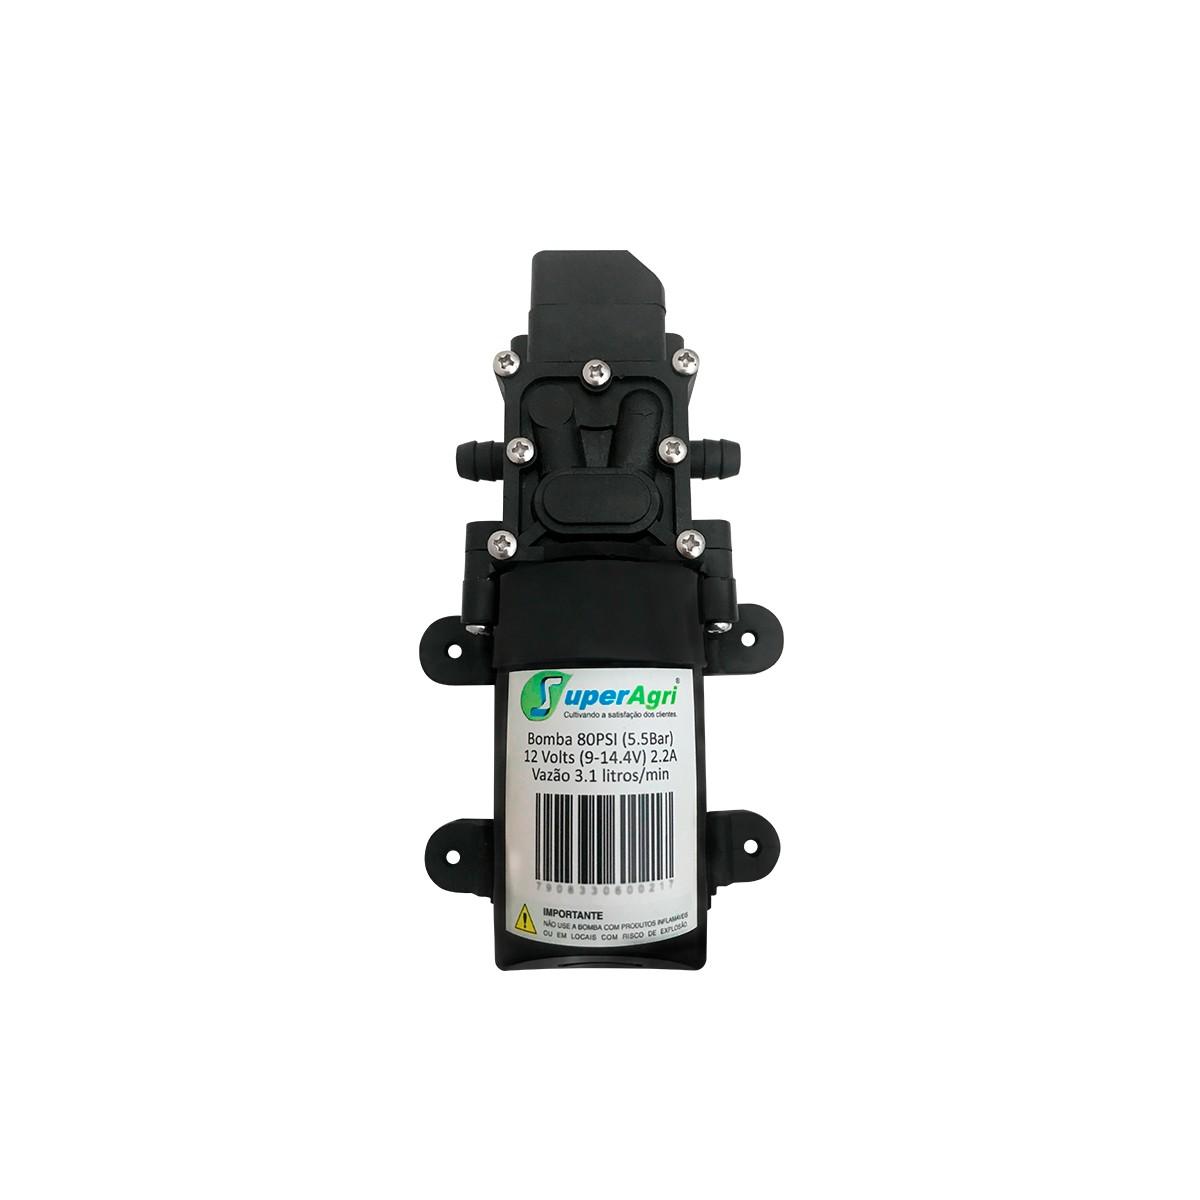 Kit De Reparo para Pulverizador 16L Bomba 80PSI + Controle de Pressão + Bateria